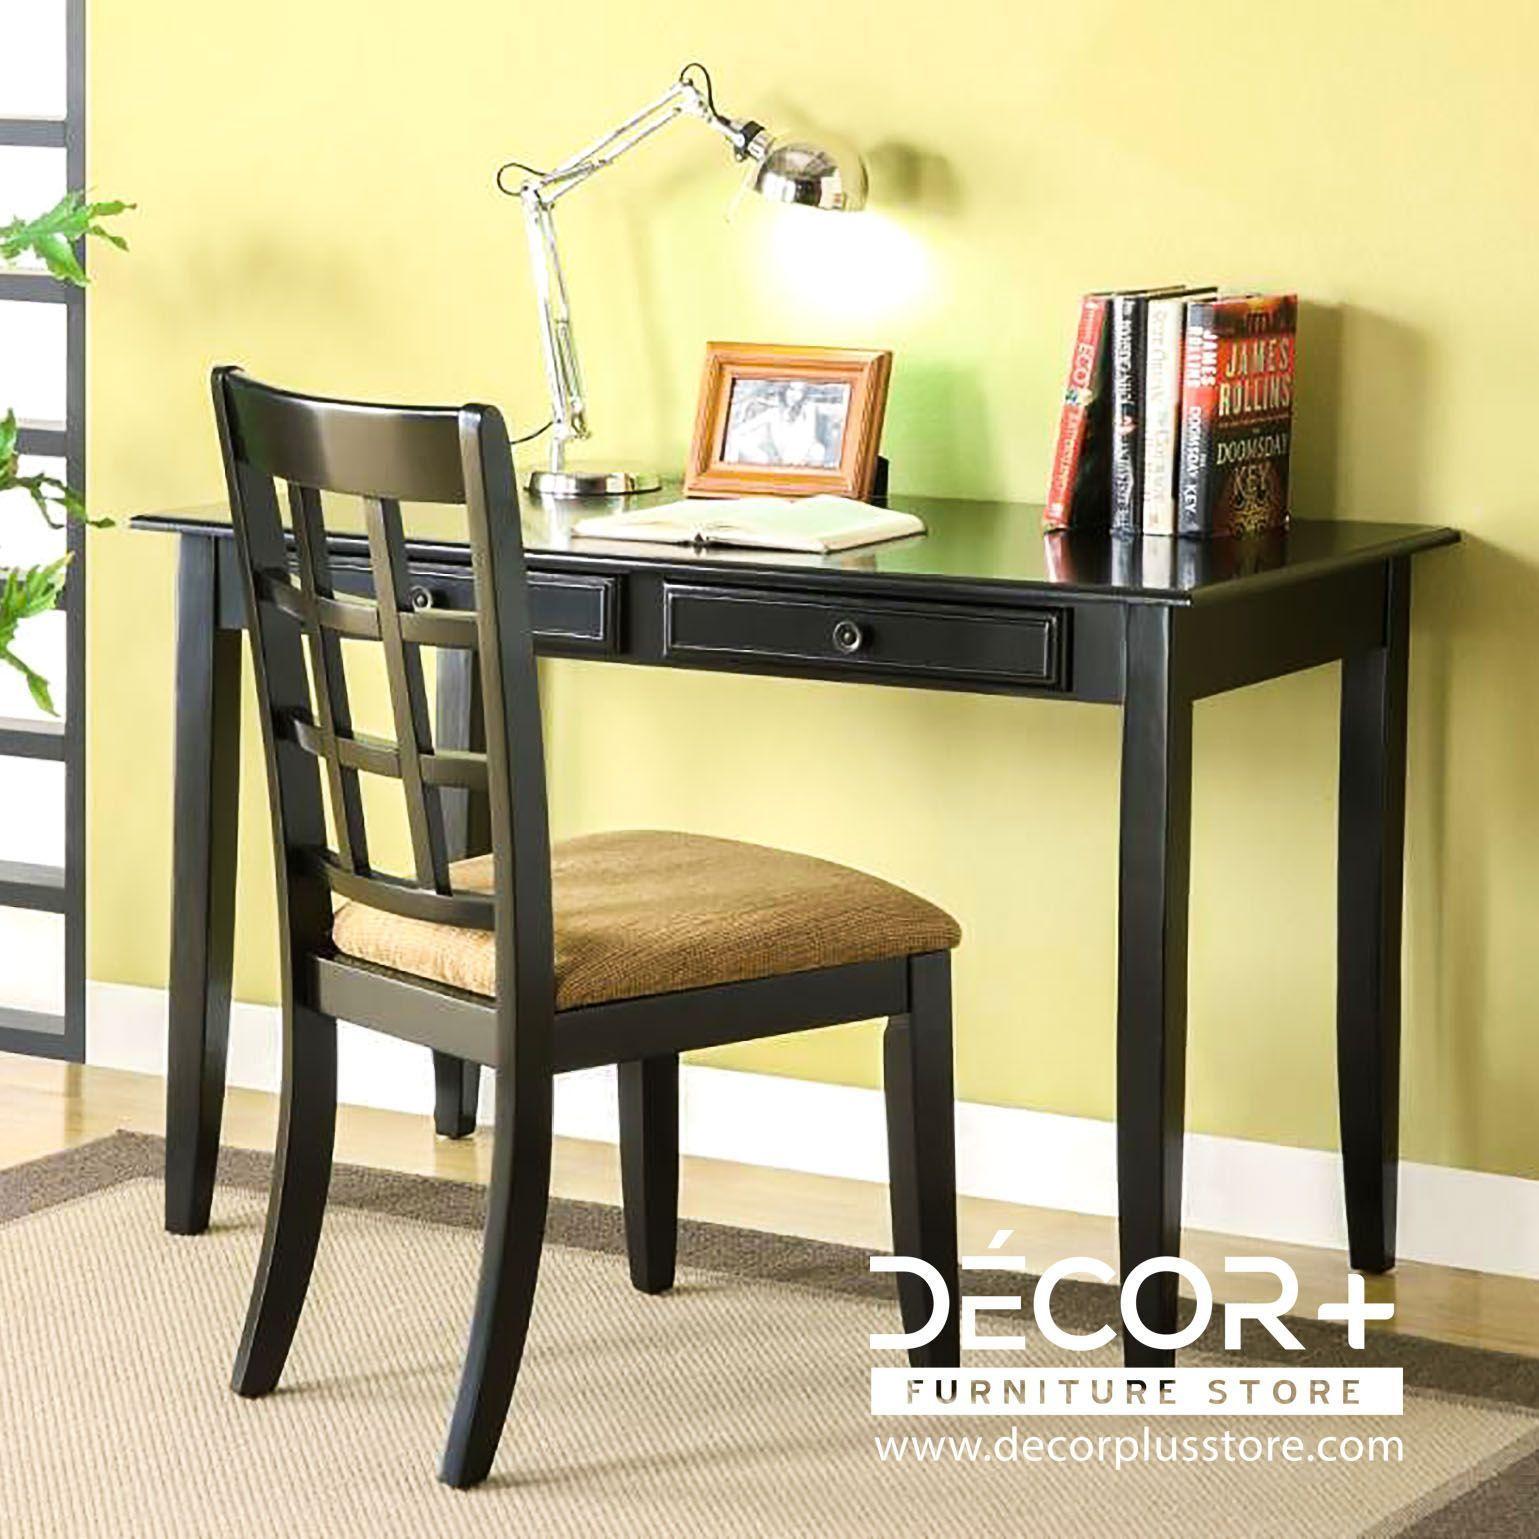 Pin by decor plus on decor pinterest coaster furniture